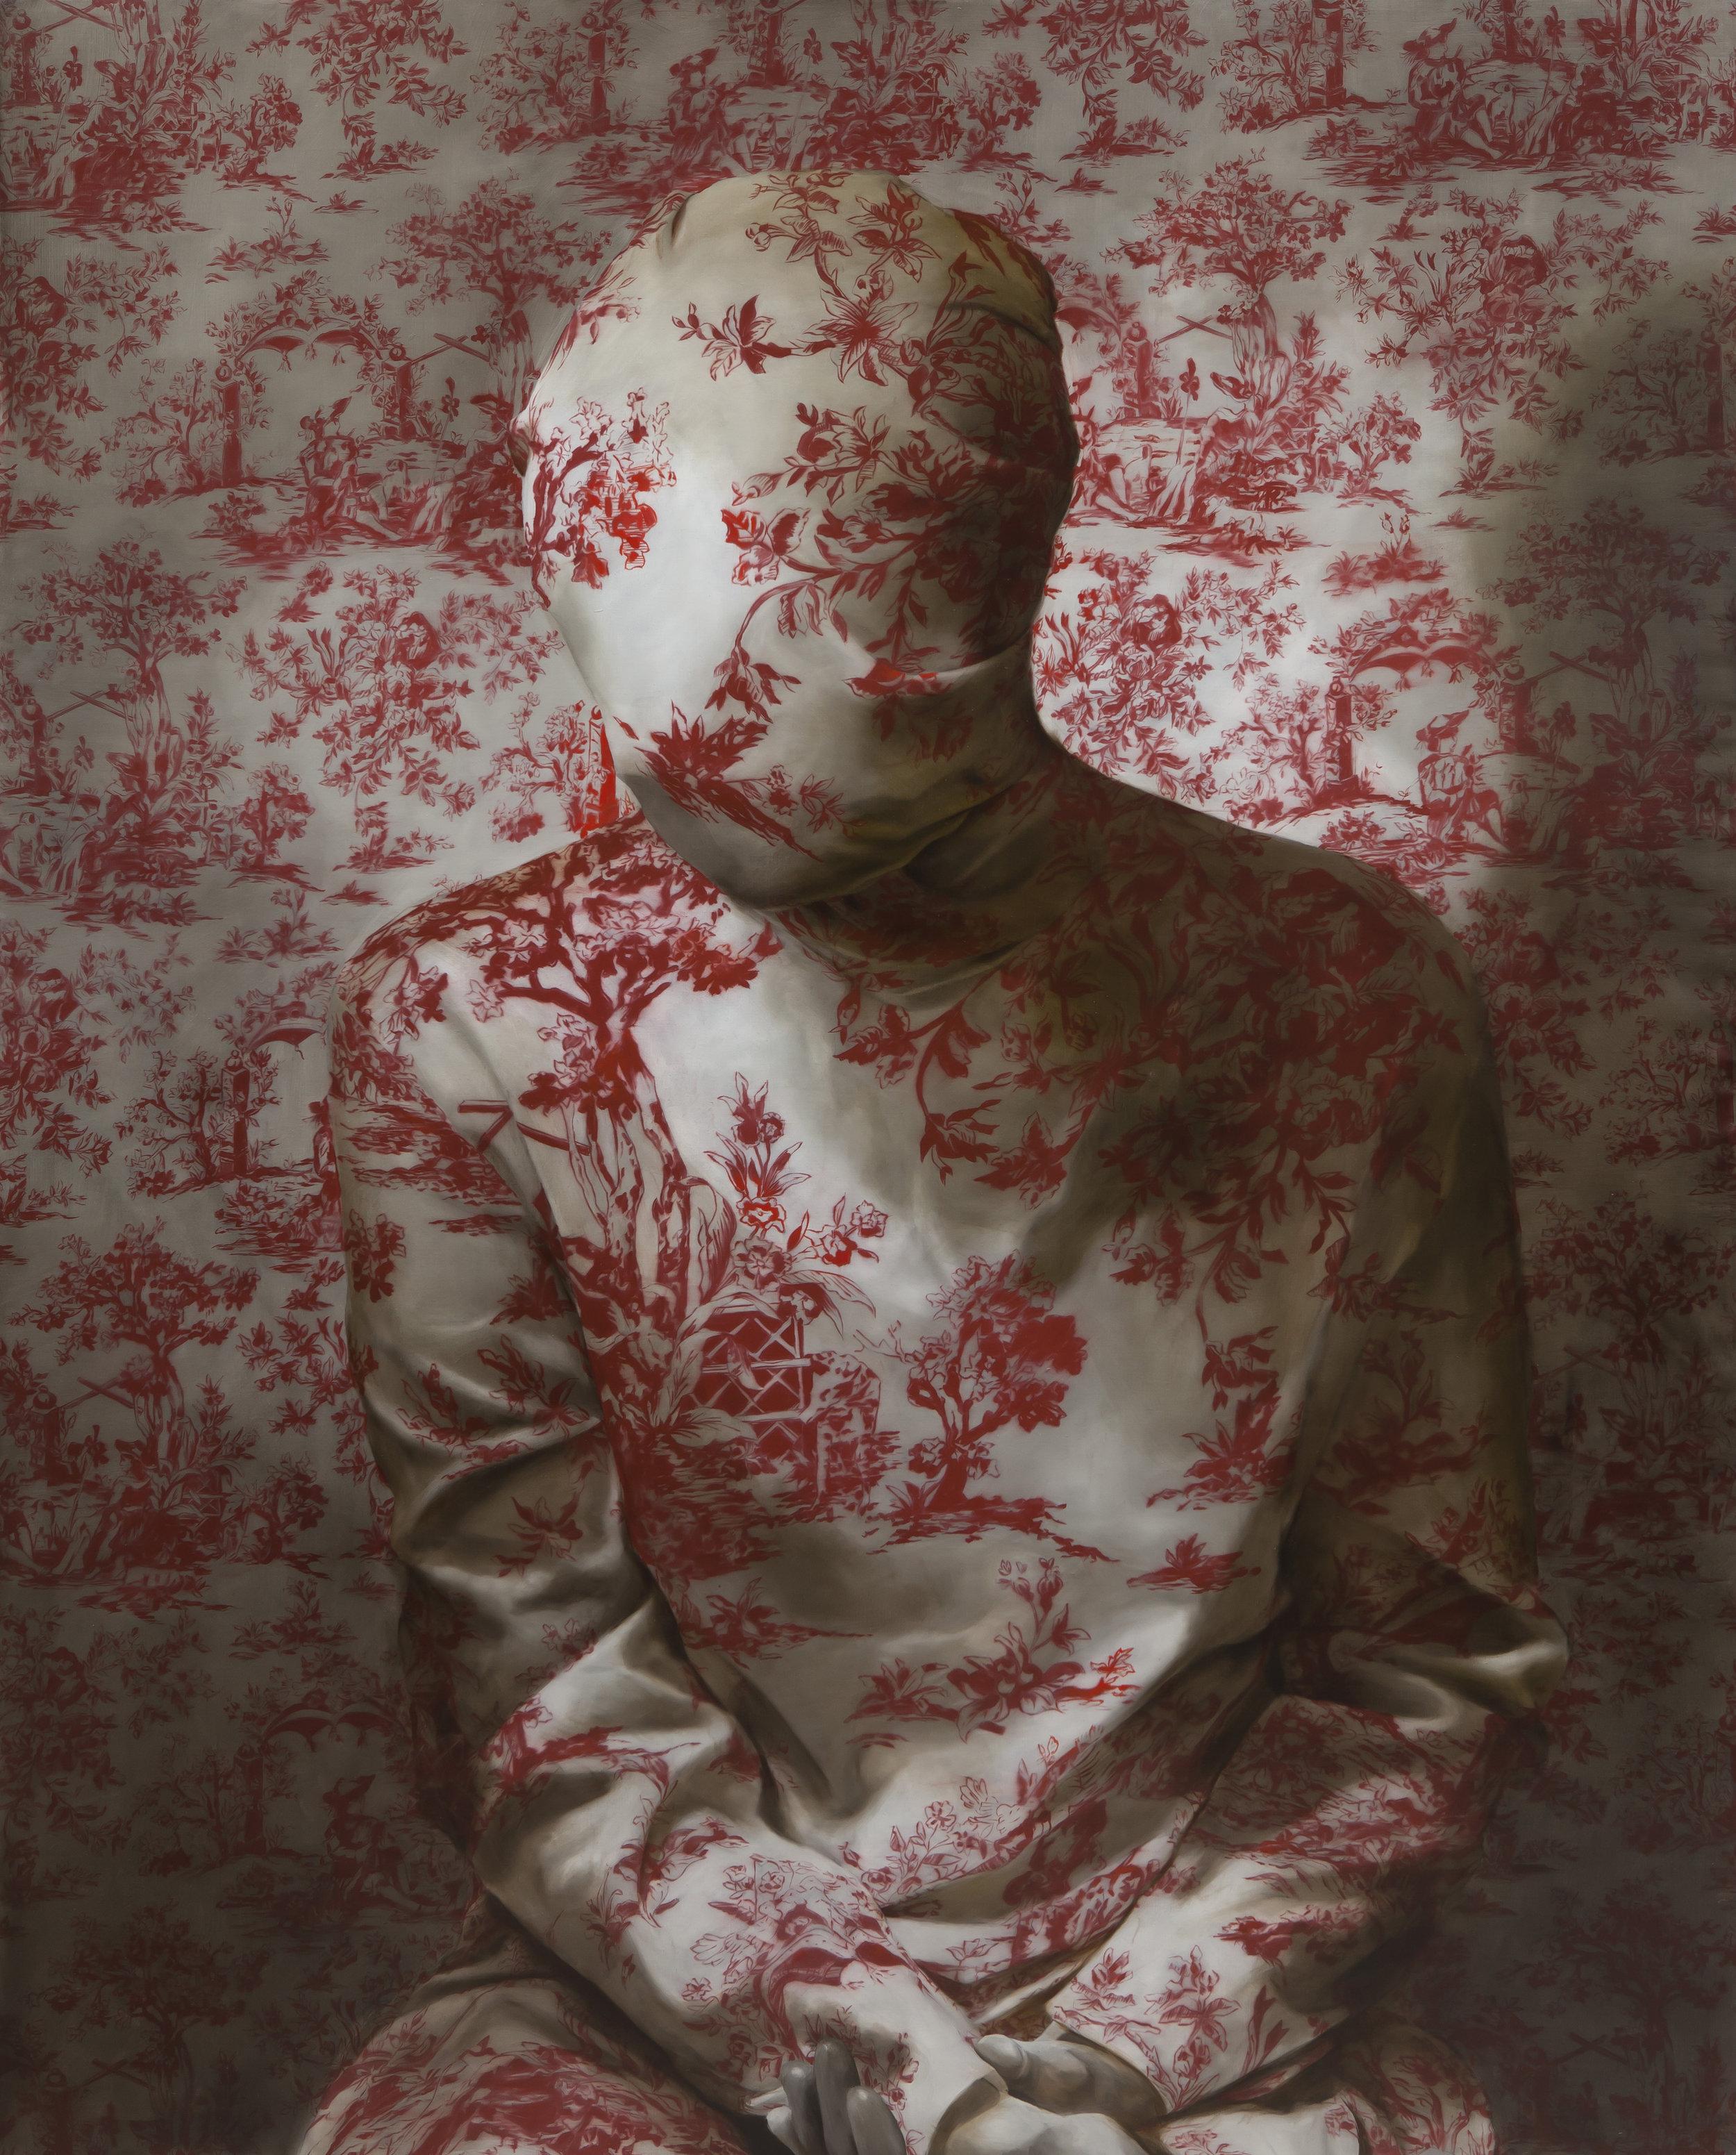 Now you see me, 2018, Markus Åkesson, 180x140cm, oil on canvas.jpg